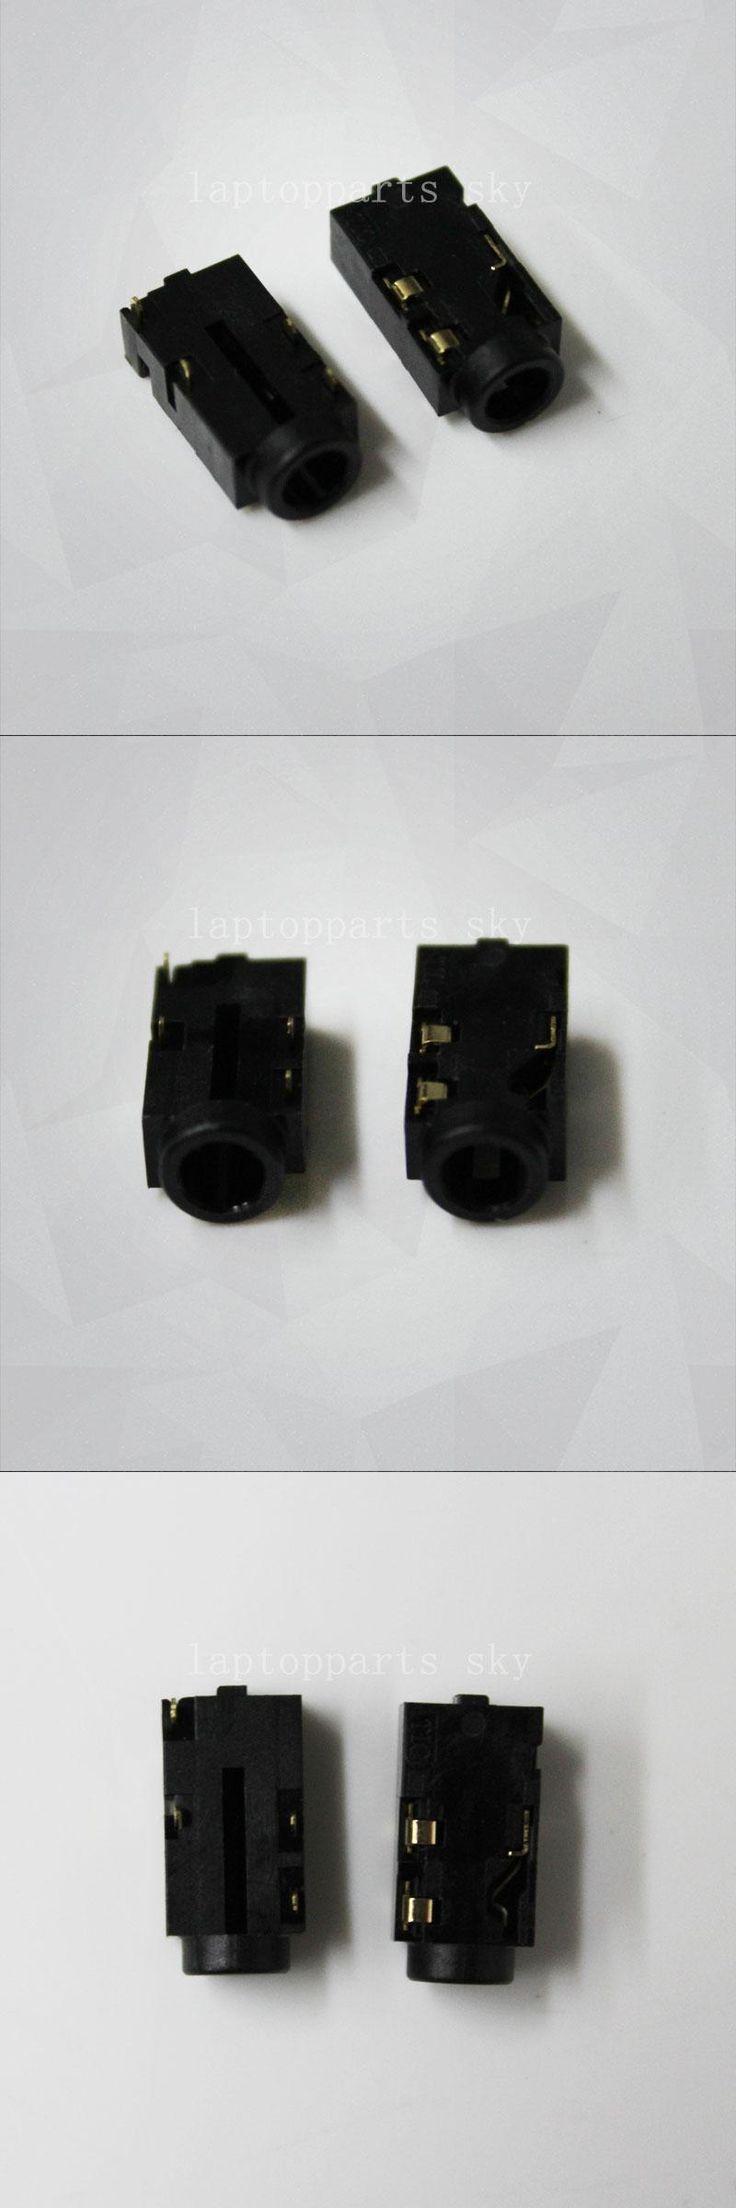 [Visit to Buy] new Headphone Audio Jack Connector for Toshiba Sattelite C850 L850 C855 L855 C870 L870 L875 motherboard Laptop MIC Socket #Advertisement